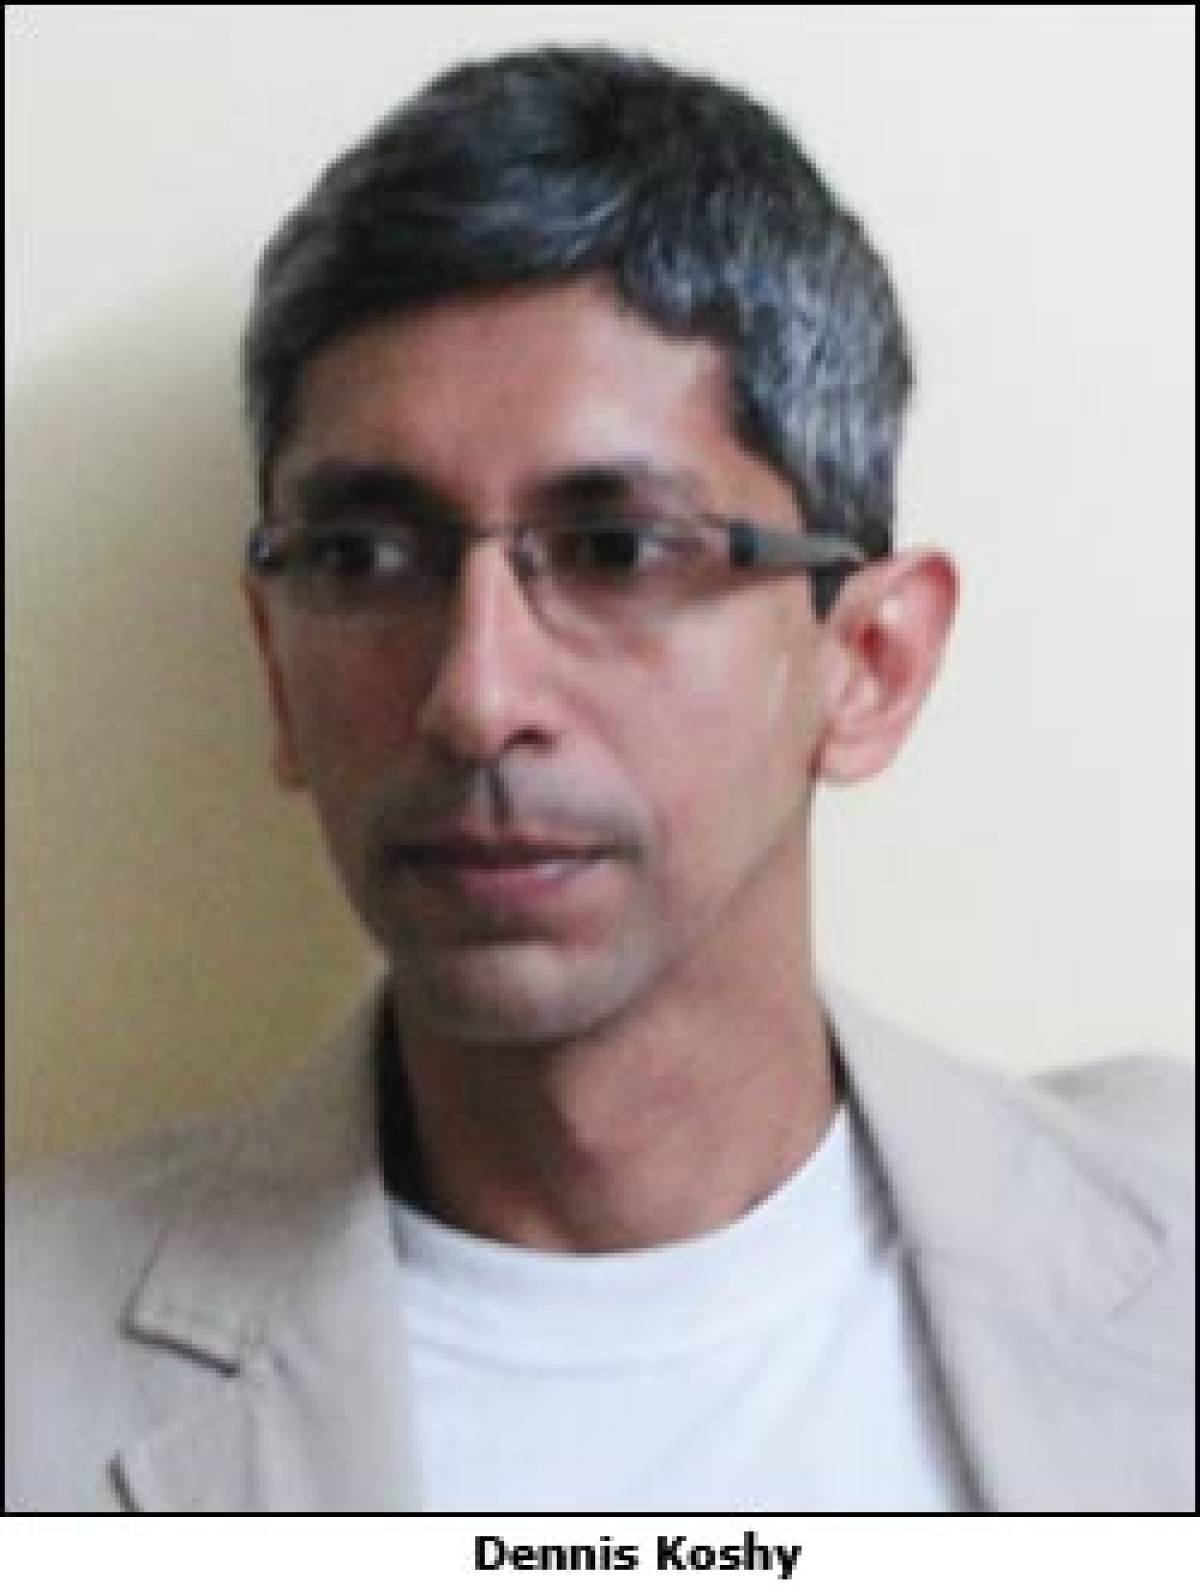 Draftfcb Ulka appoints Dennis Koshy as VP, Bengaluru